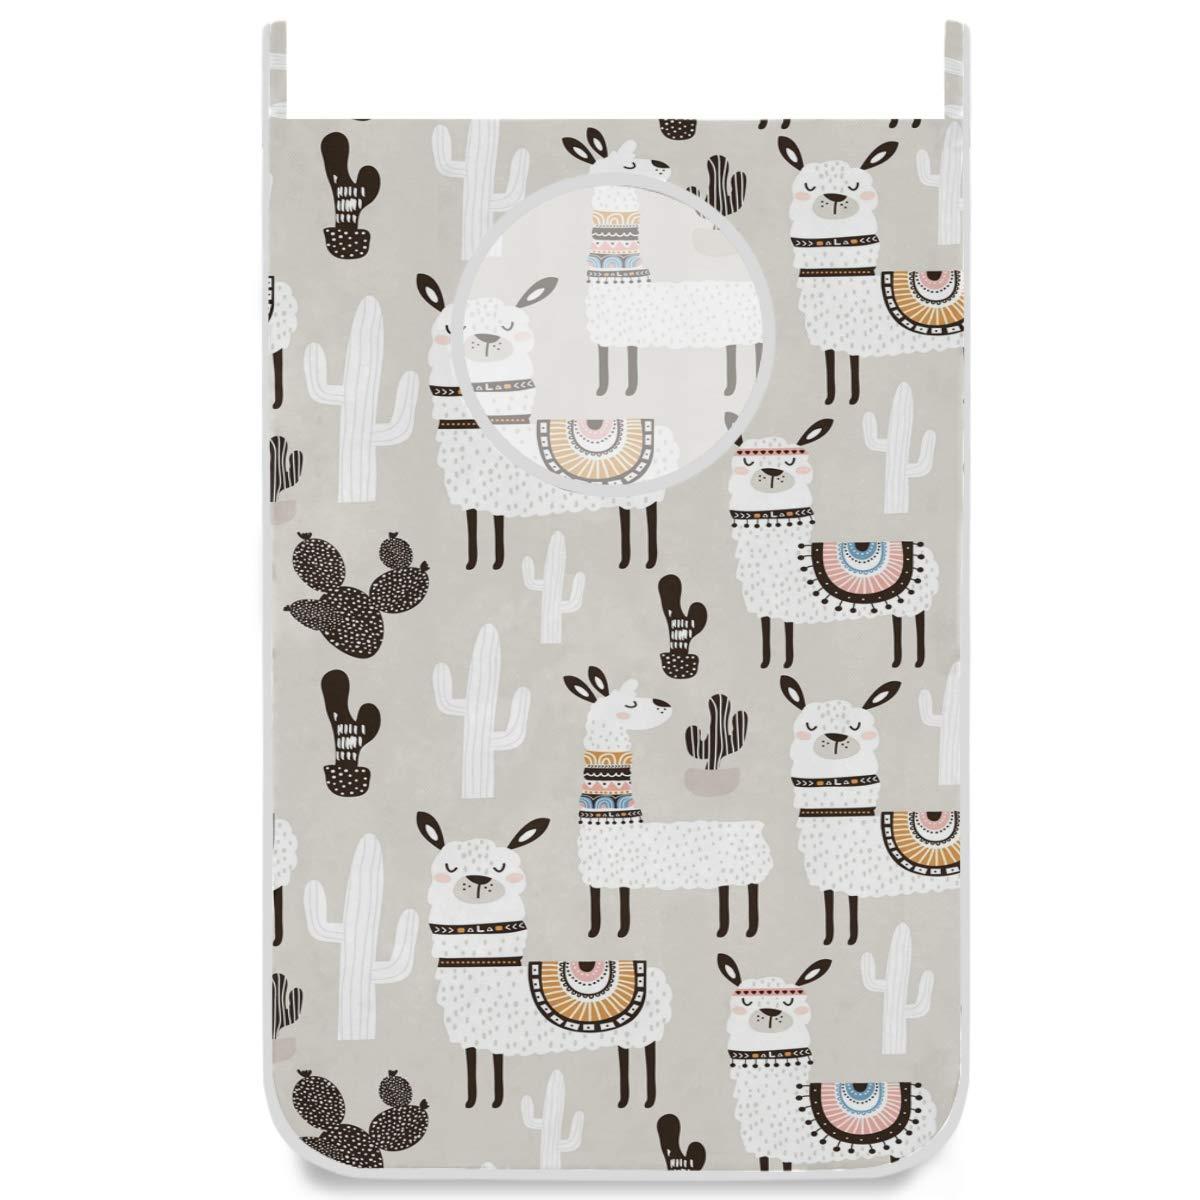 ZzWwR Boho Cute Cartoon Llama Cactus Space Saver Door Hanging Hamper Bag, Open Top Laundry Basket with Free Hooks for Bathroom,Kids Room,Dorm (Large Size 30